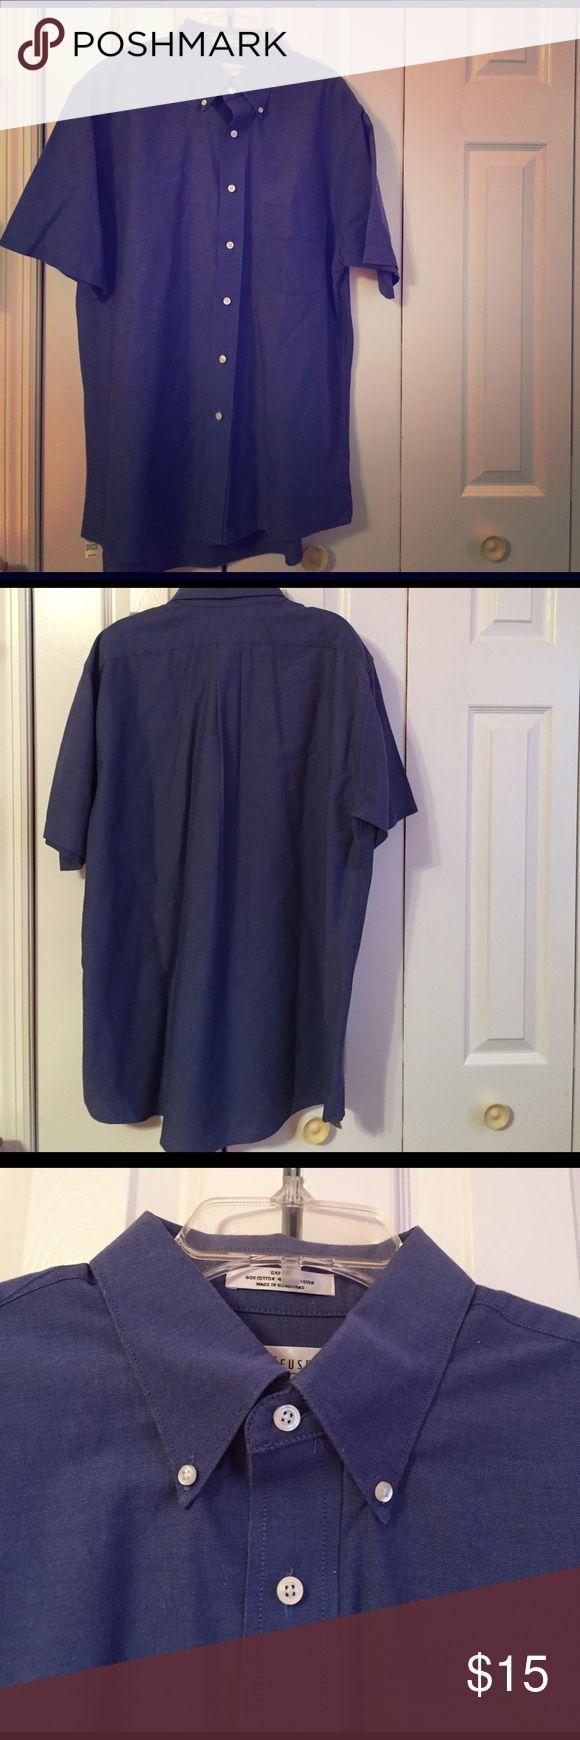 Men's Van Heusen short sleeve Oxford shirt Rarely worn, great condition. Men's short sleeve blue Oxford shirt. 16 1/2 Large. Wrinkle free material. 60% Cotton, 40% Polyester. Van Heusen Shirts Dress Shirts